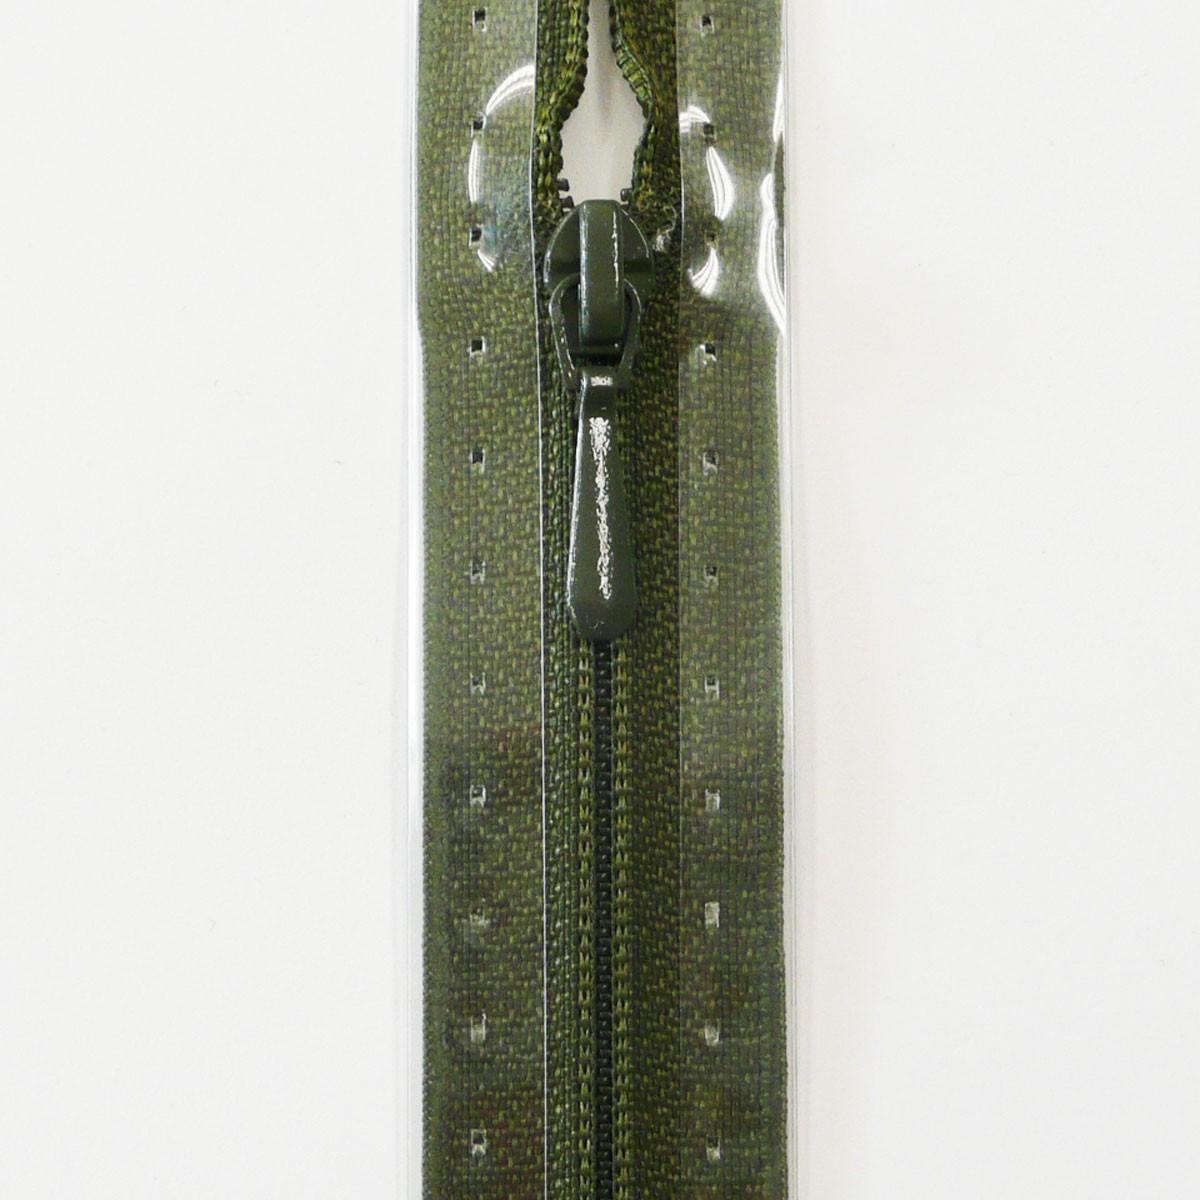 RV S2 Typ 0 Nahtfein 25 cm Fla br-oliv